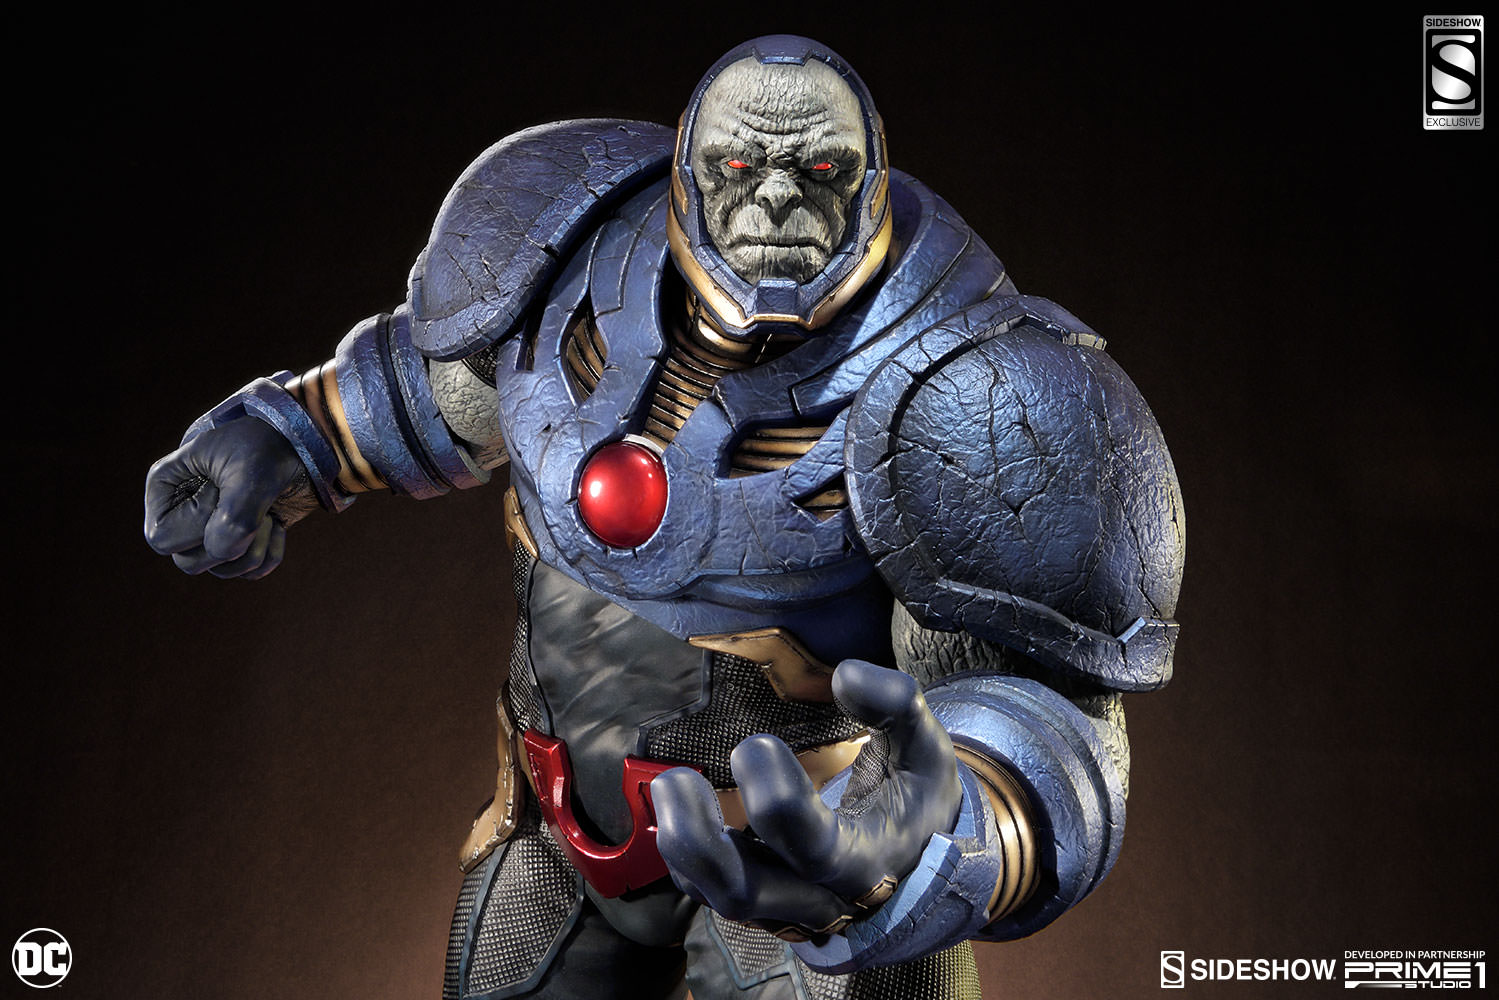 Justice League New 52 Darkseid Statue